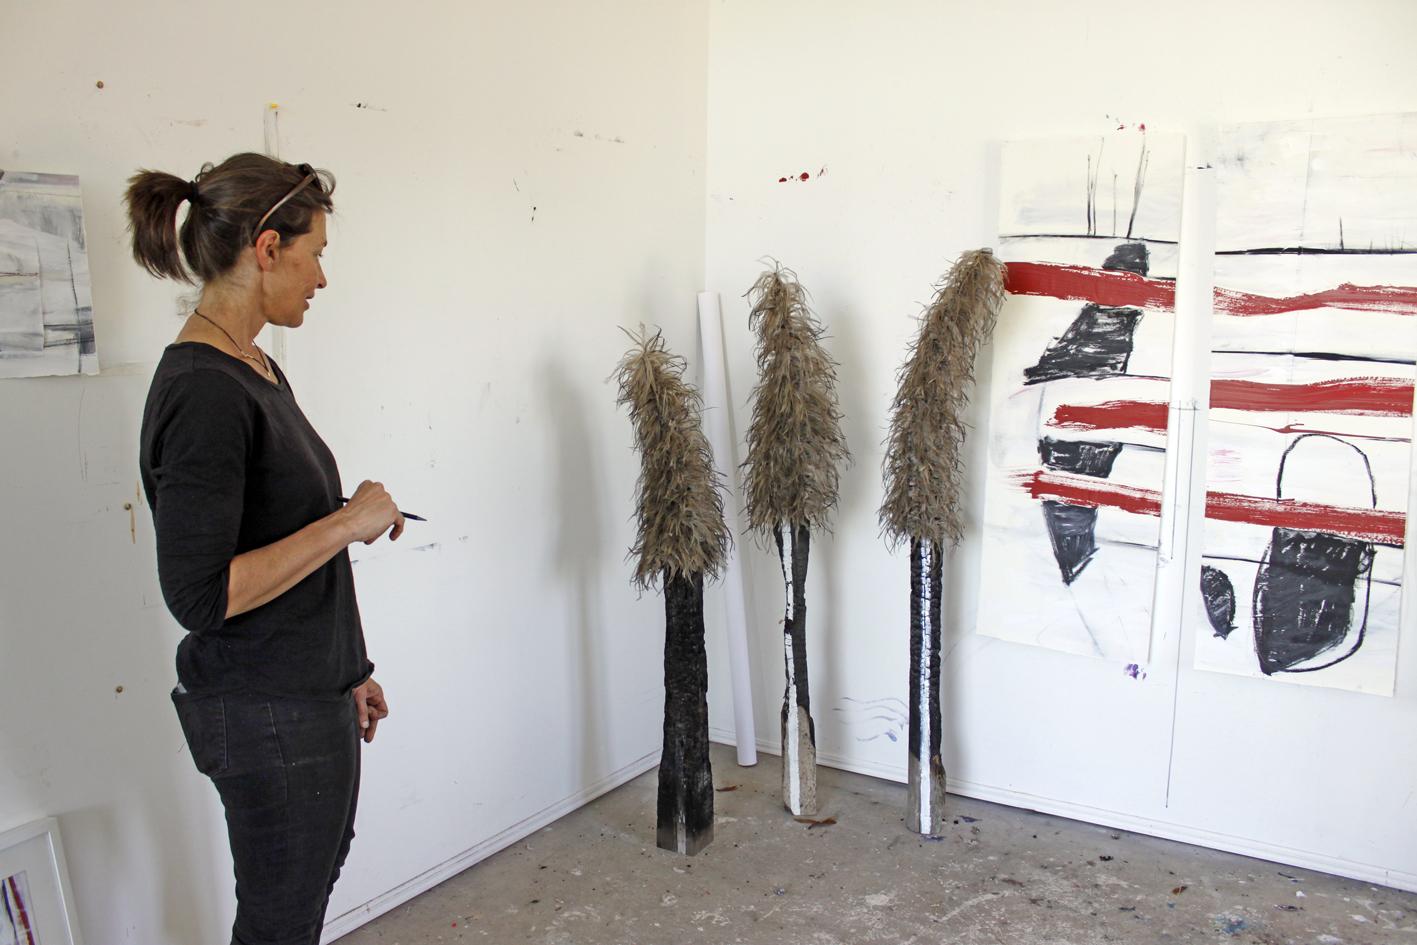 Australian Artist studio visit, Tonya Graham, contemporary sculpture, The Corner Store Gallery, Orange NSW, photograph by Madeline Young